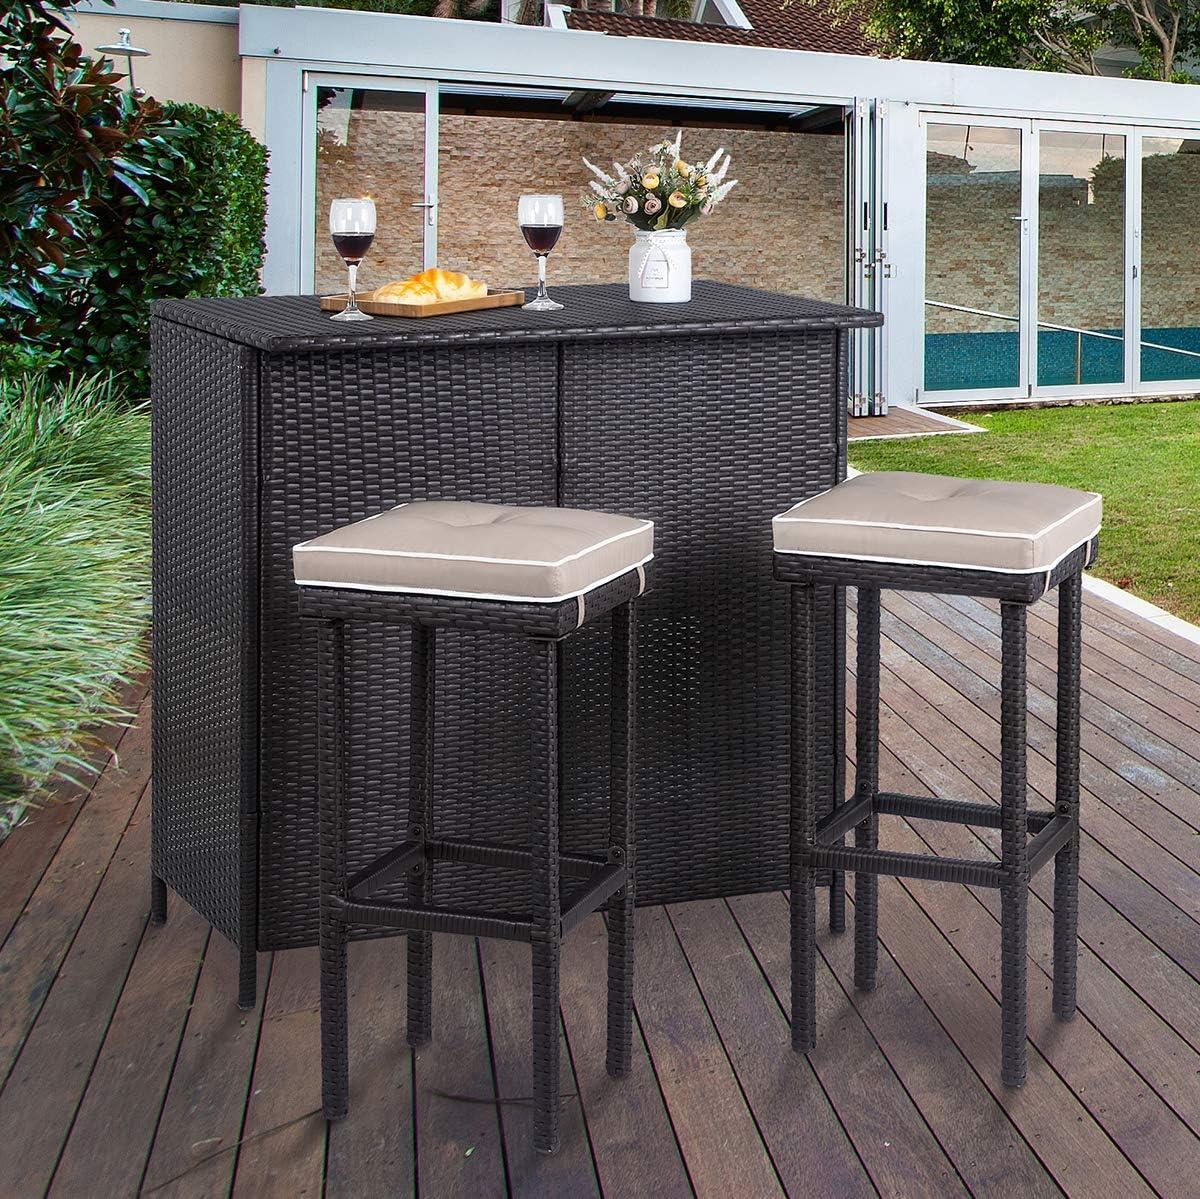 Goujxcy Outdoor Patio Wicker Bar Counter Table with 2 Shelves and 1 Rails Garden Poolside Rattan Bar Counter Table Patio Bar Furniture for Backyard Patio, Lawn & Garden Tables